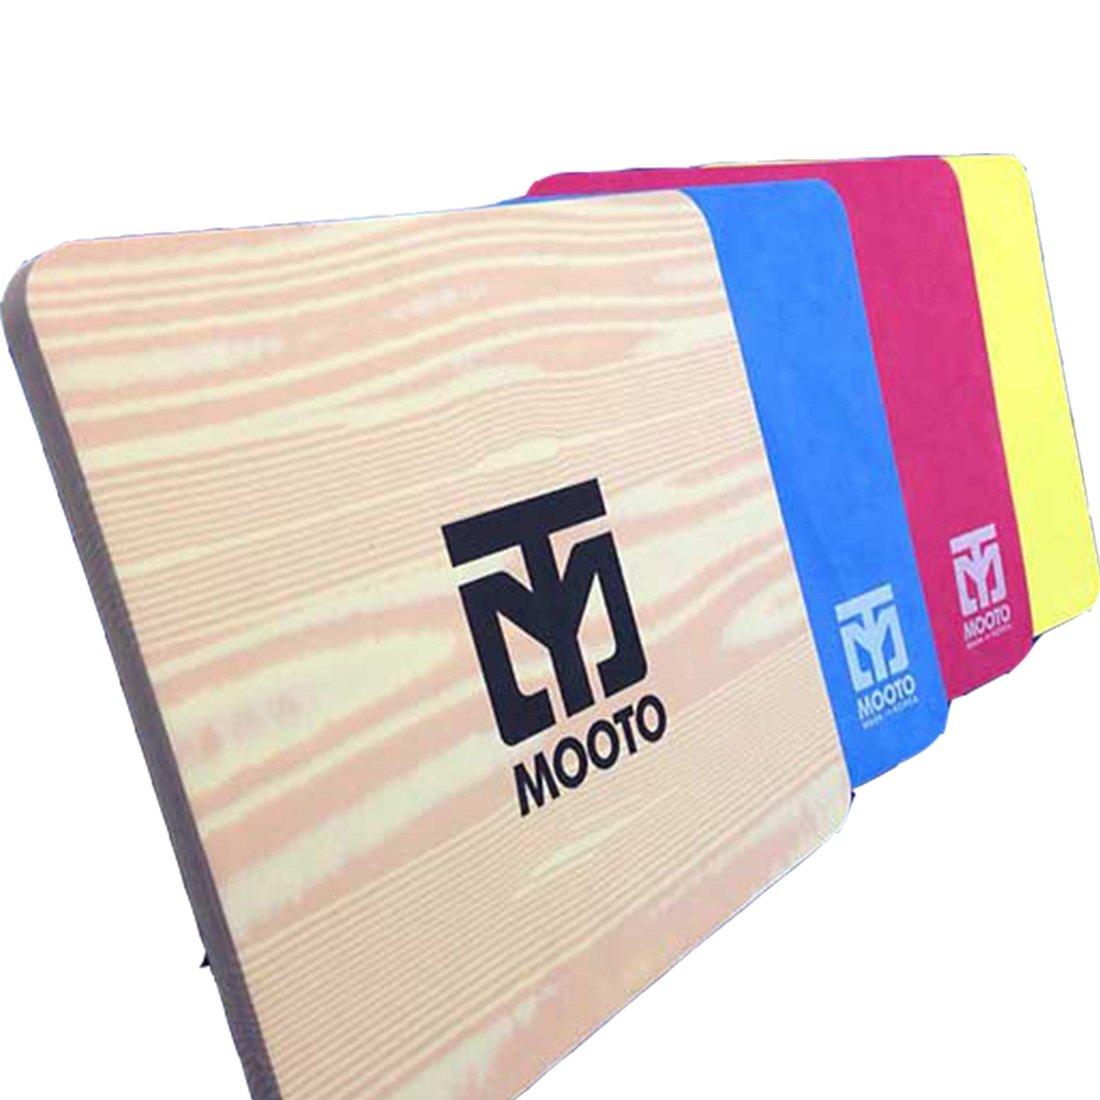 Mooto EVA Board for Taekwondo Breaking Tile Korea Gym Poomsae 1EA (Red)